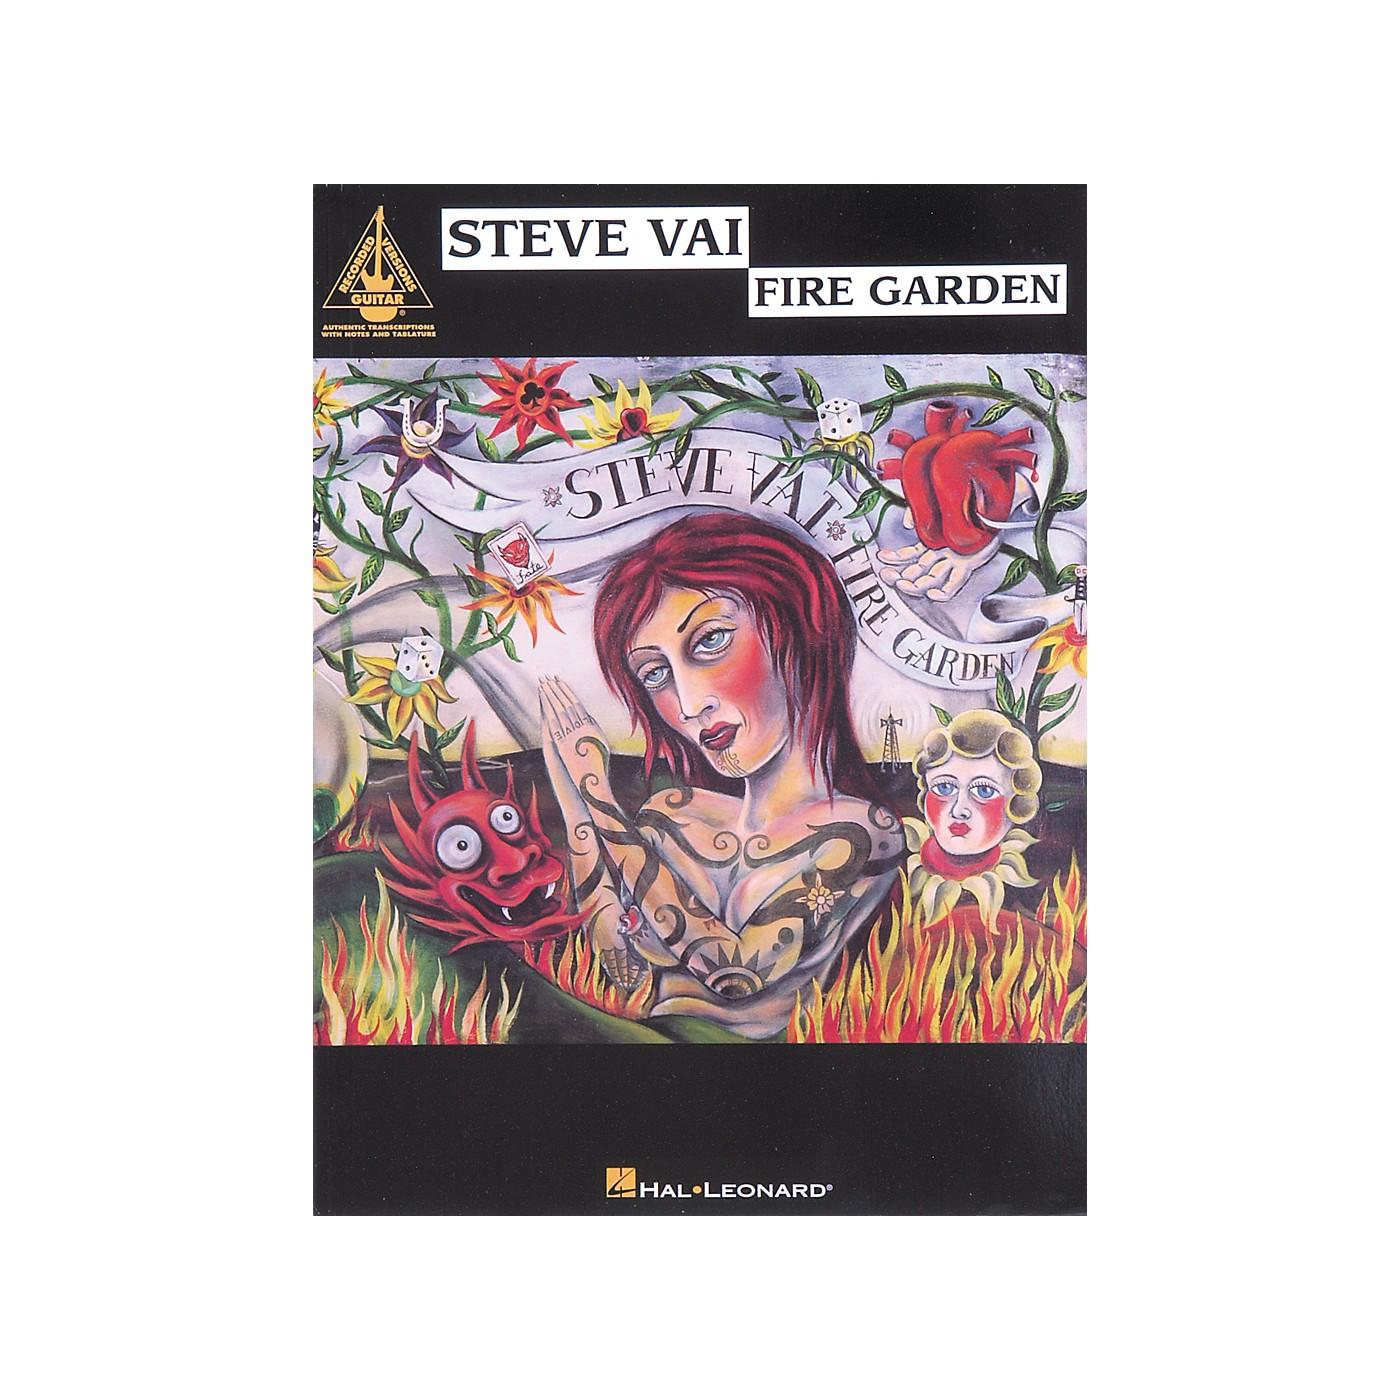 Hal Leonard Steve Vai Fire Garden Guitar Tab Songbook thumbnail